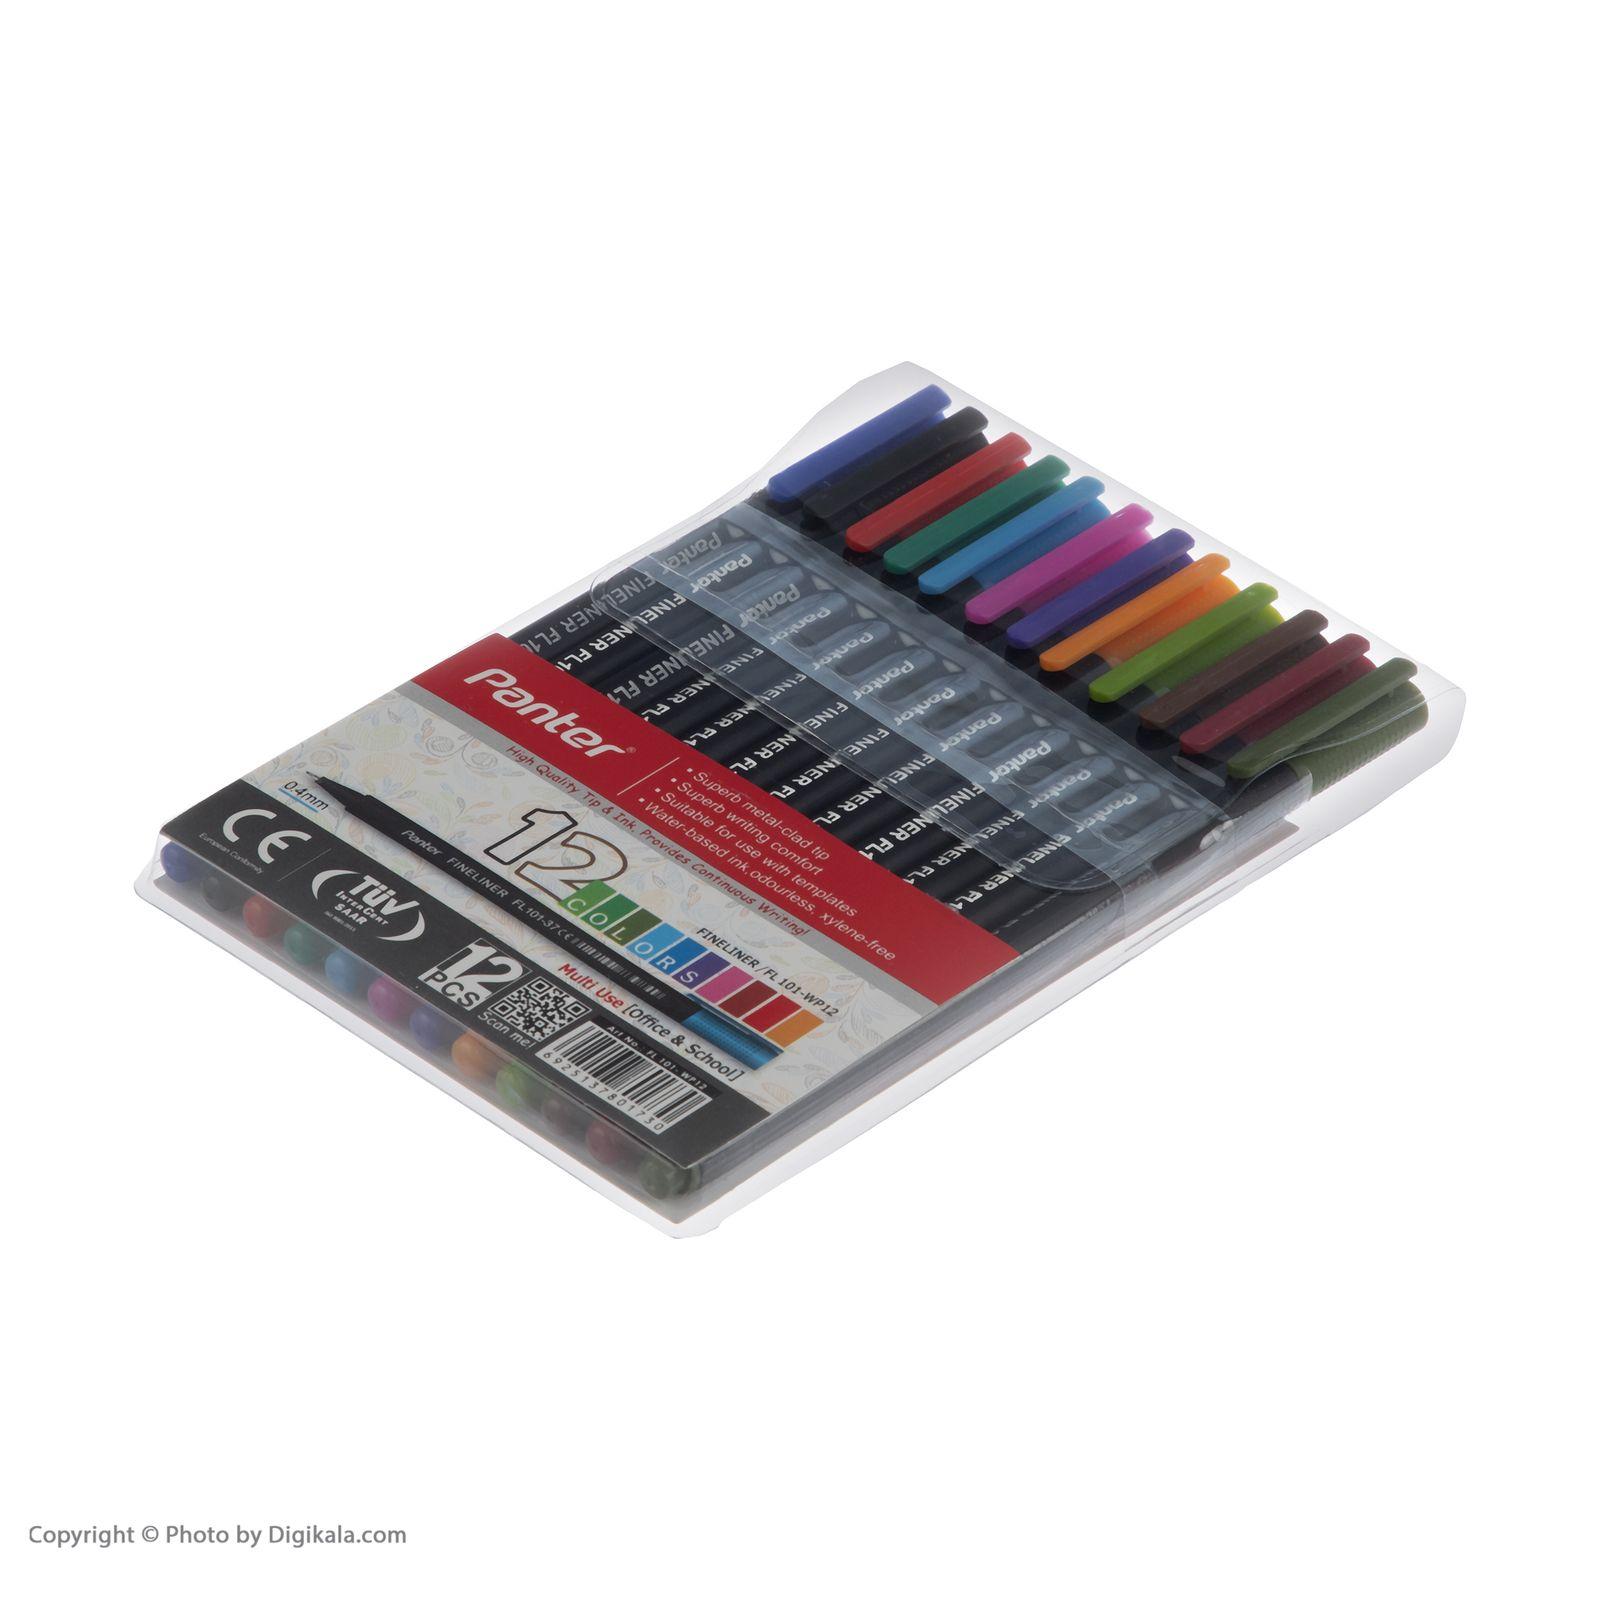 روان نویس 12 رنگ پنتر مدل FL 101-WP main 1 3